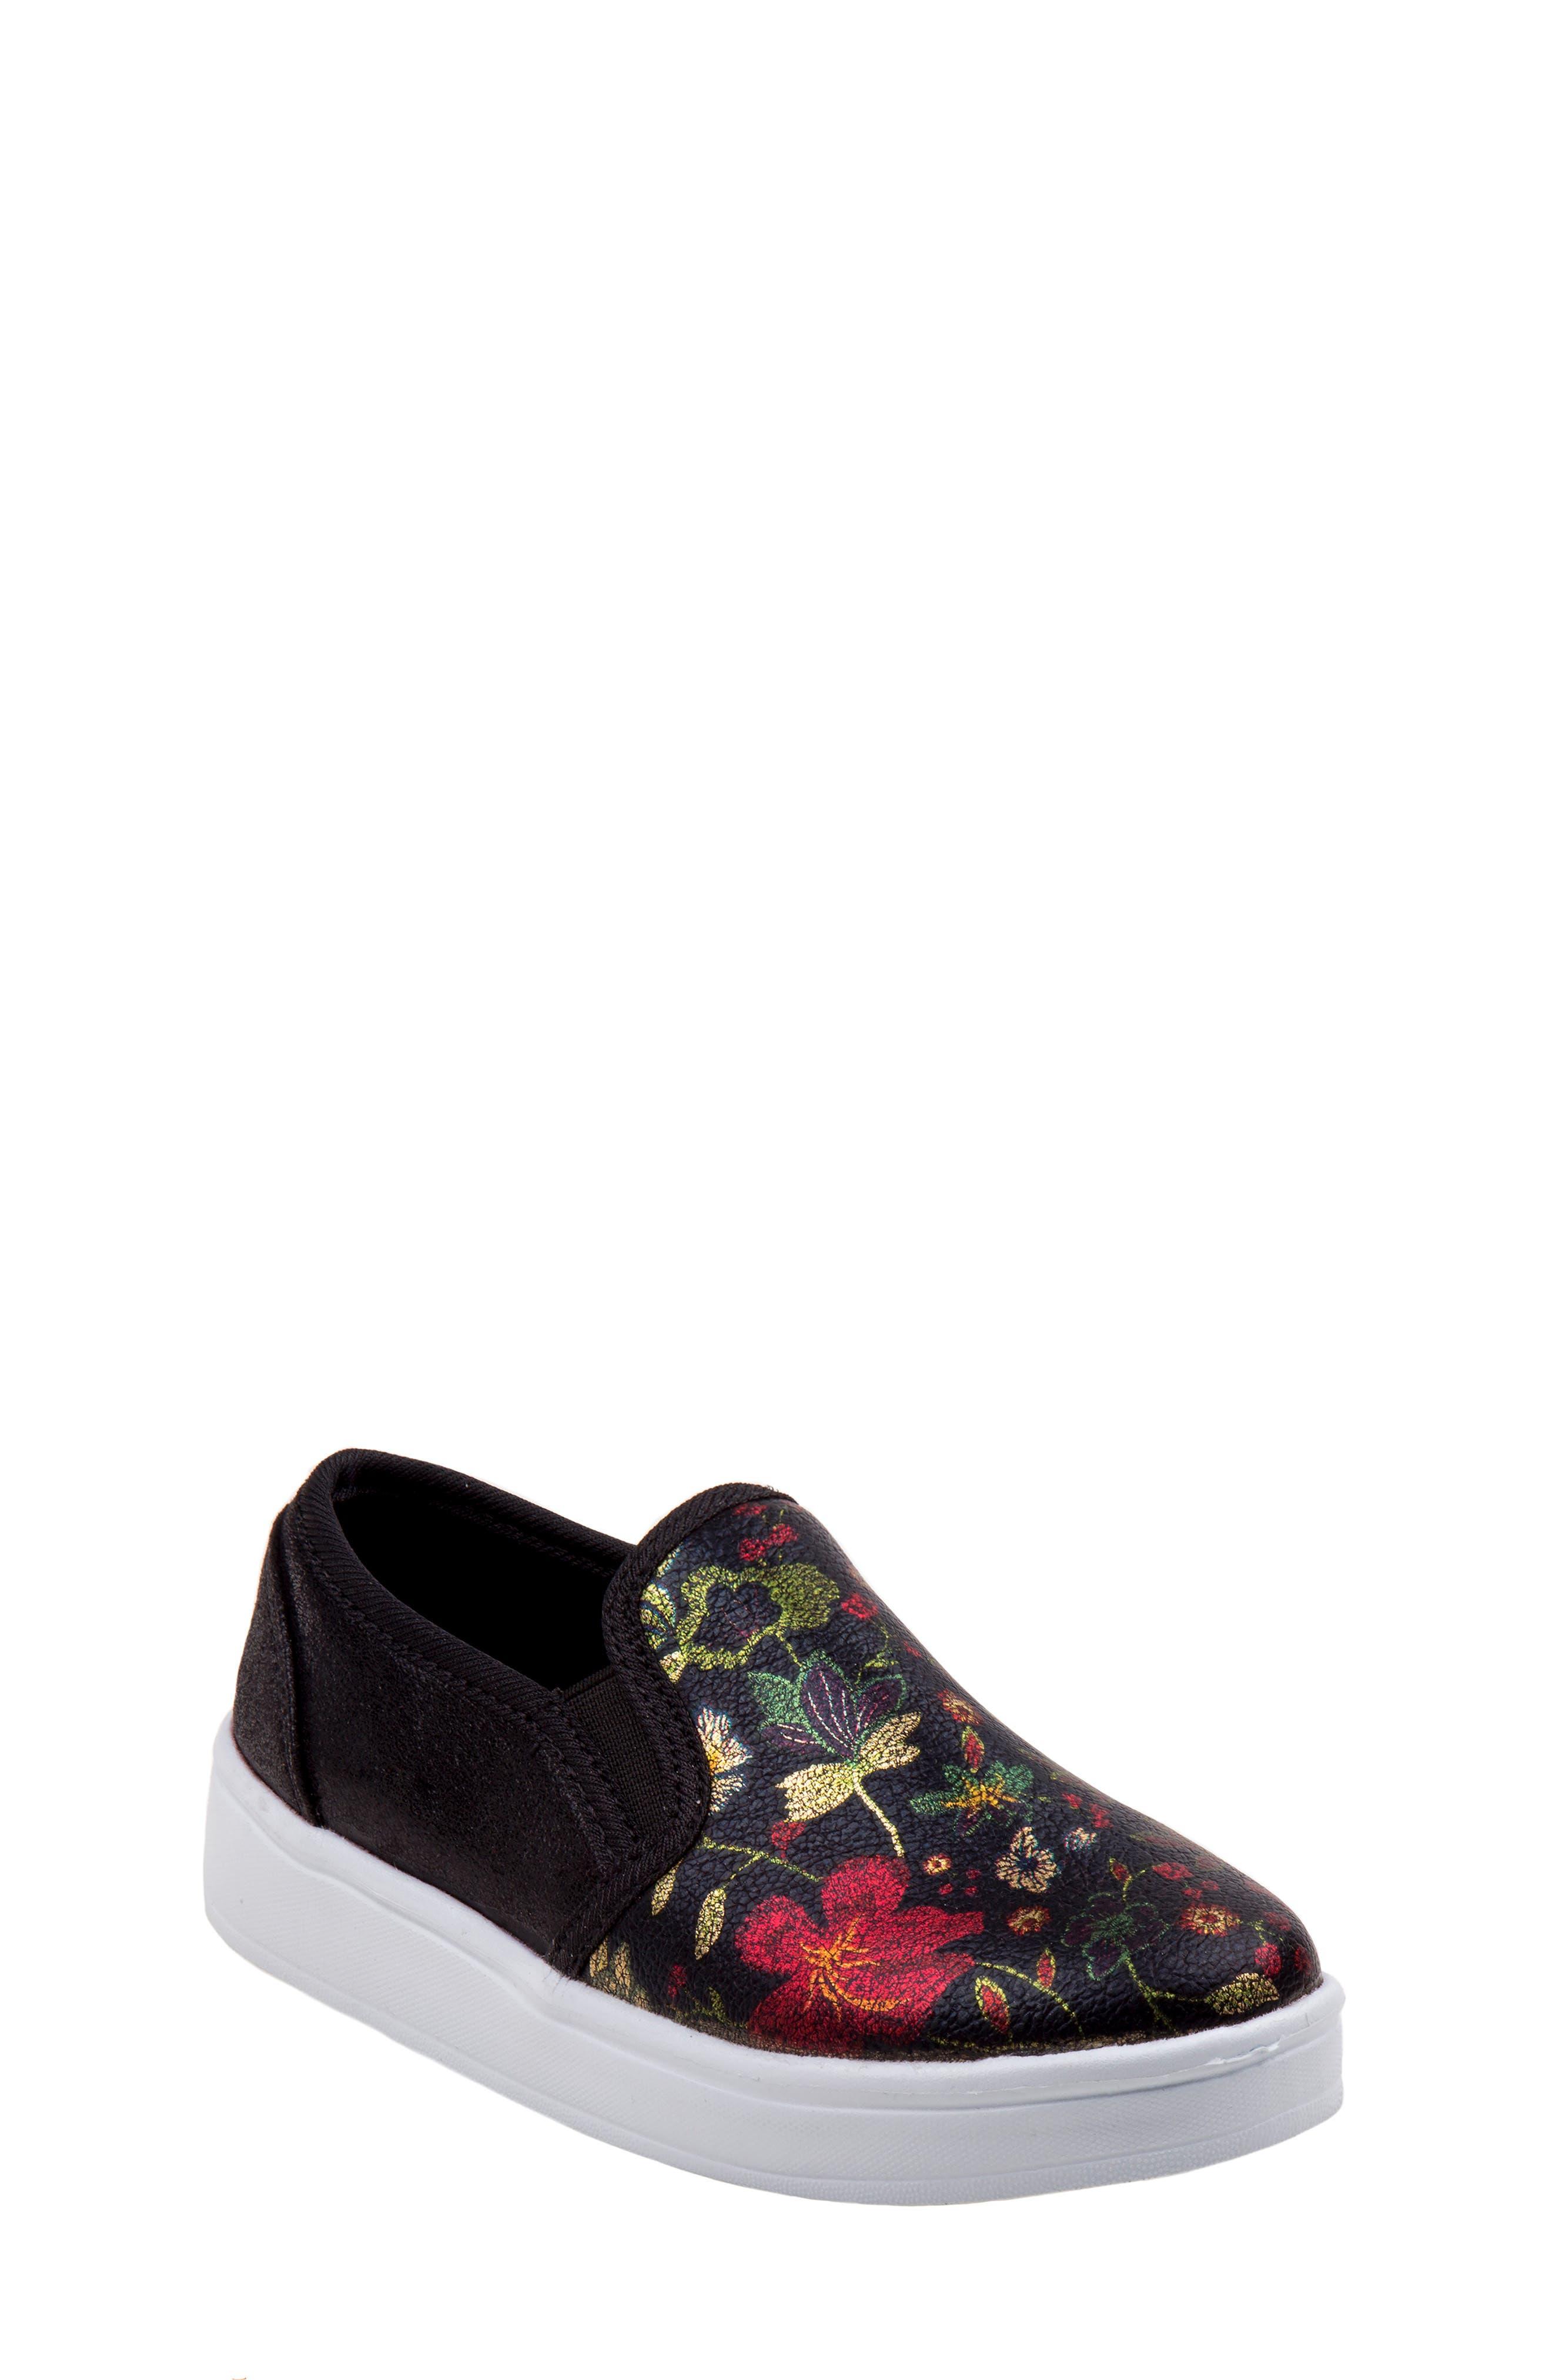 Floral Slip-On Sneaker,                             Main thumbnail 1, color,                             BLACK